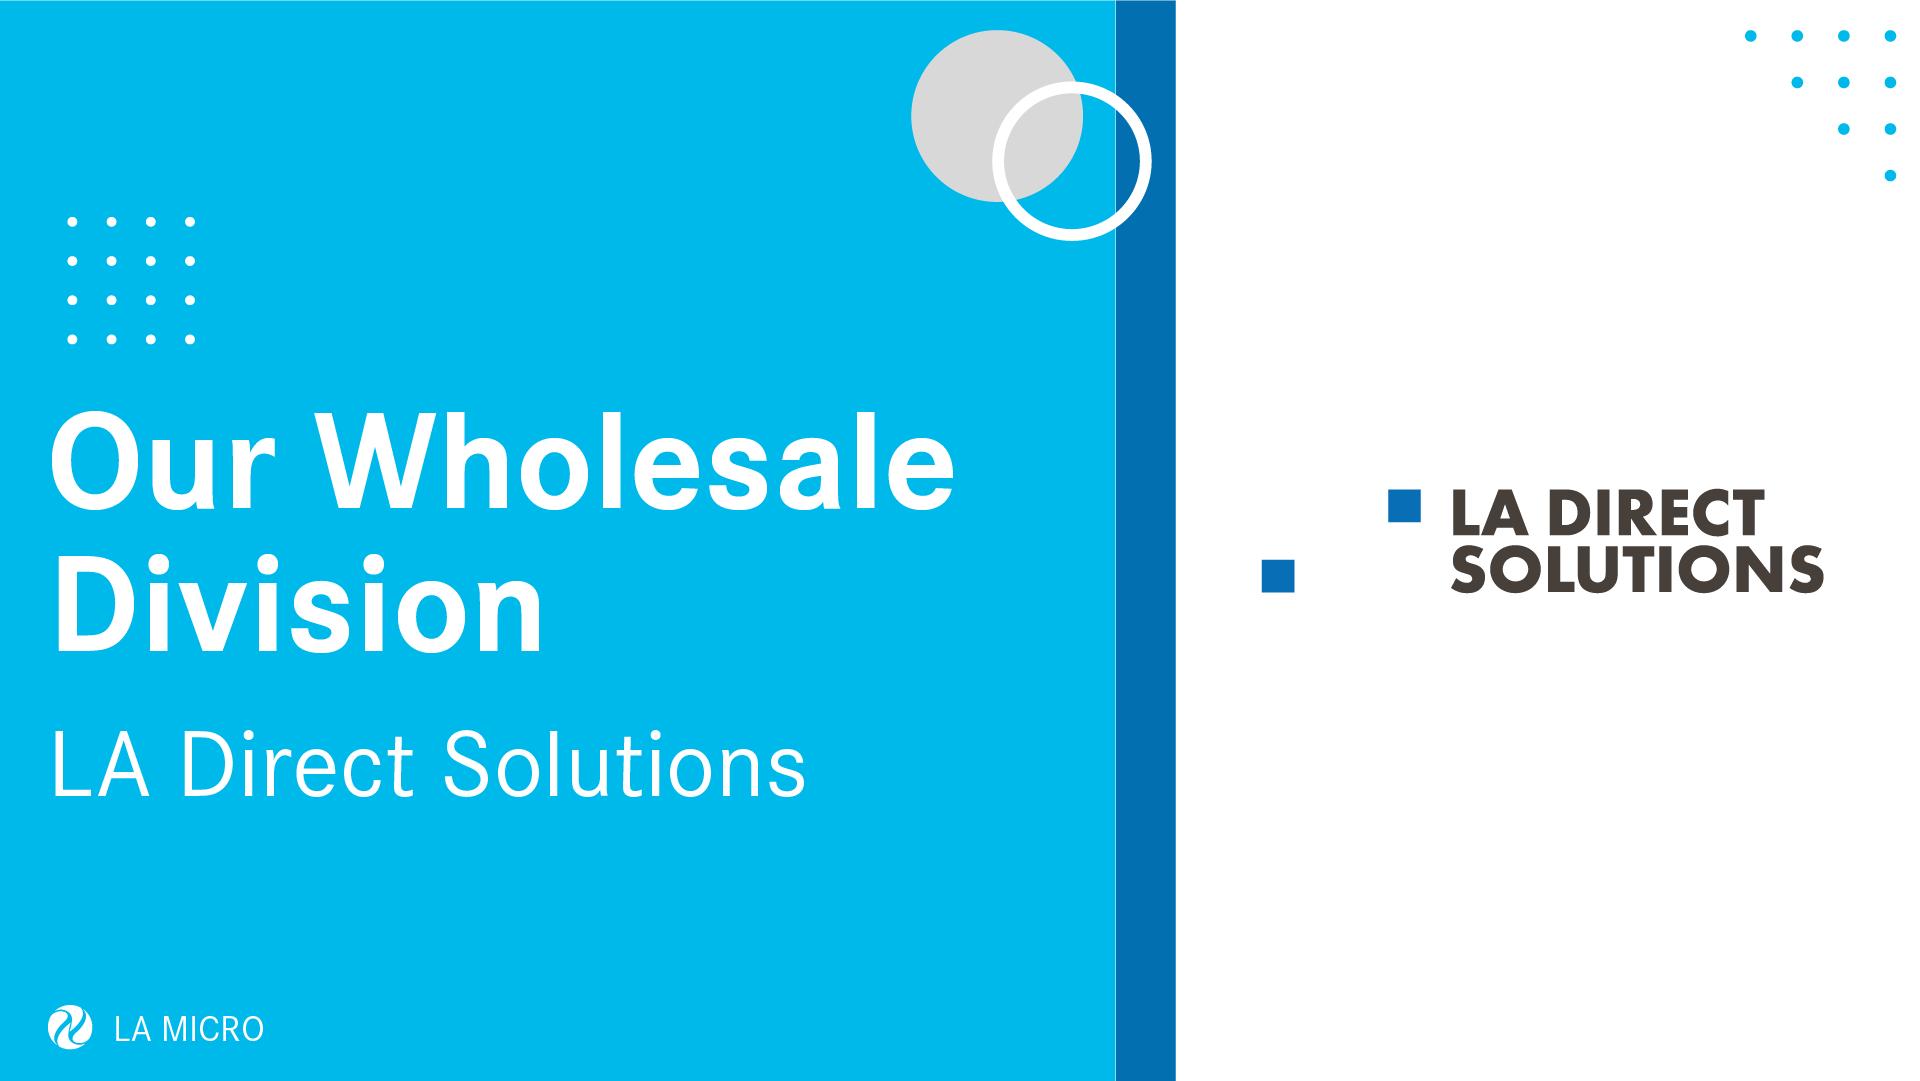 LA Direct Solutions Division